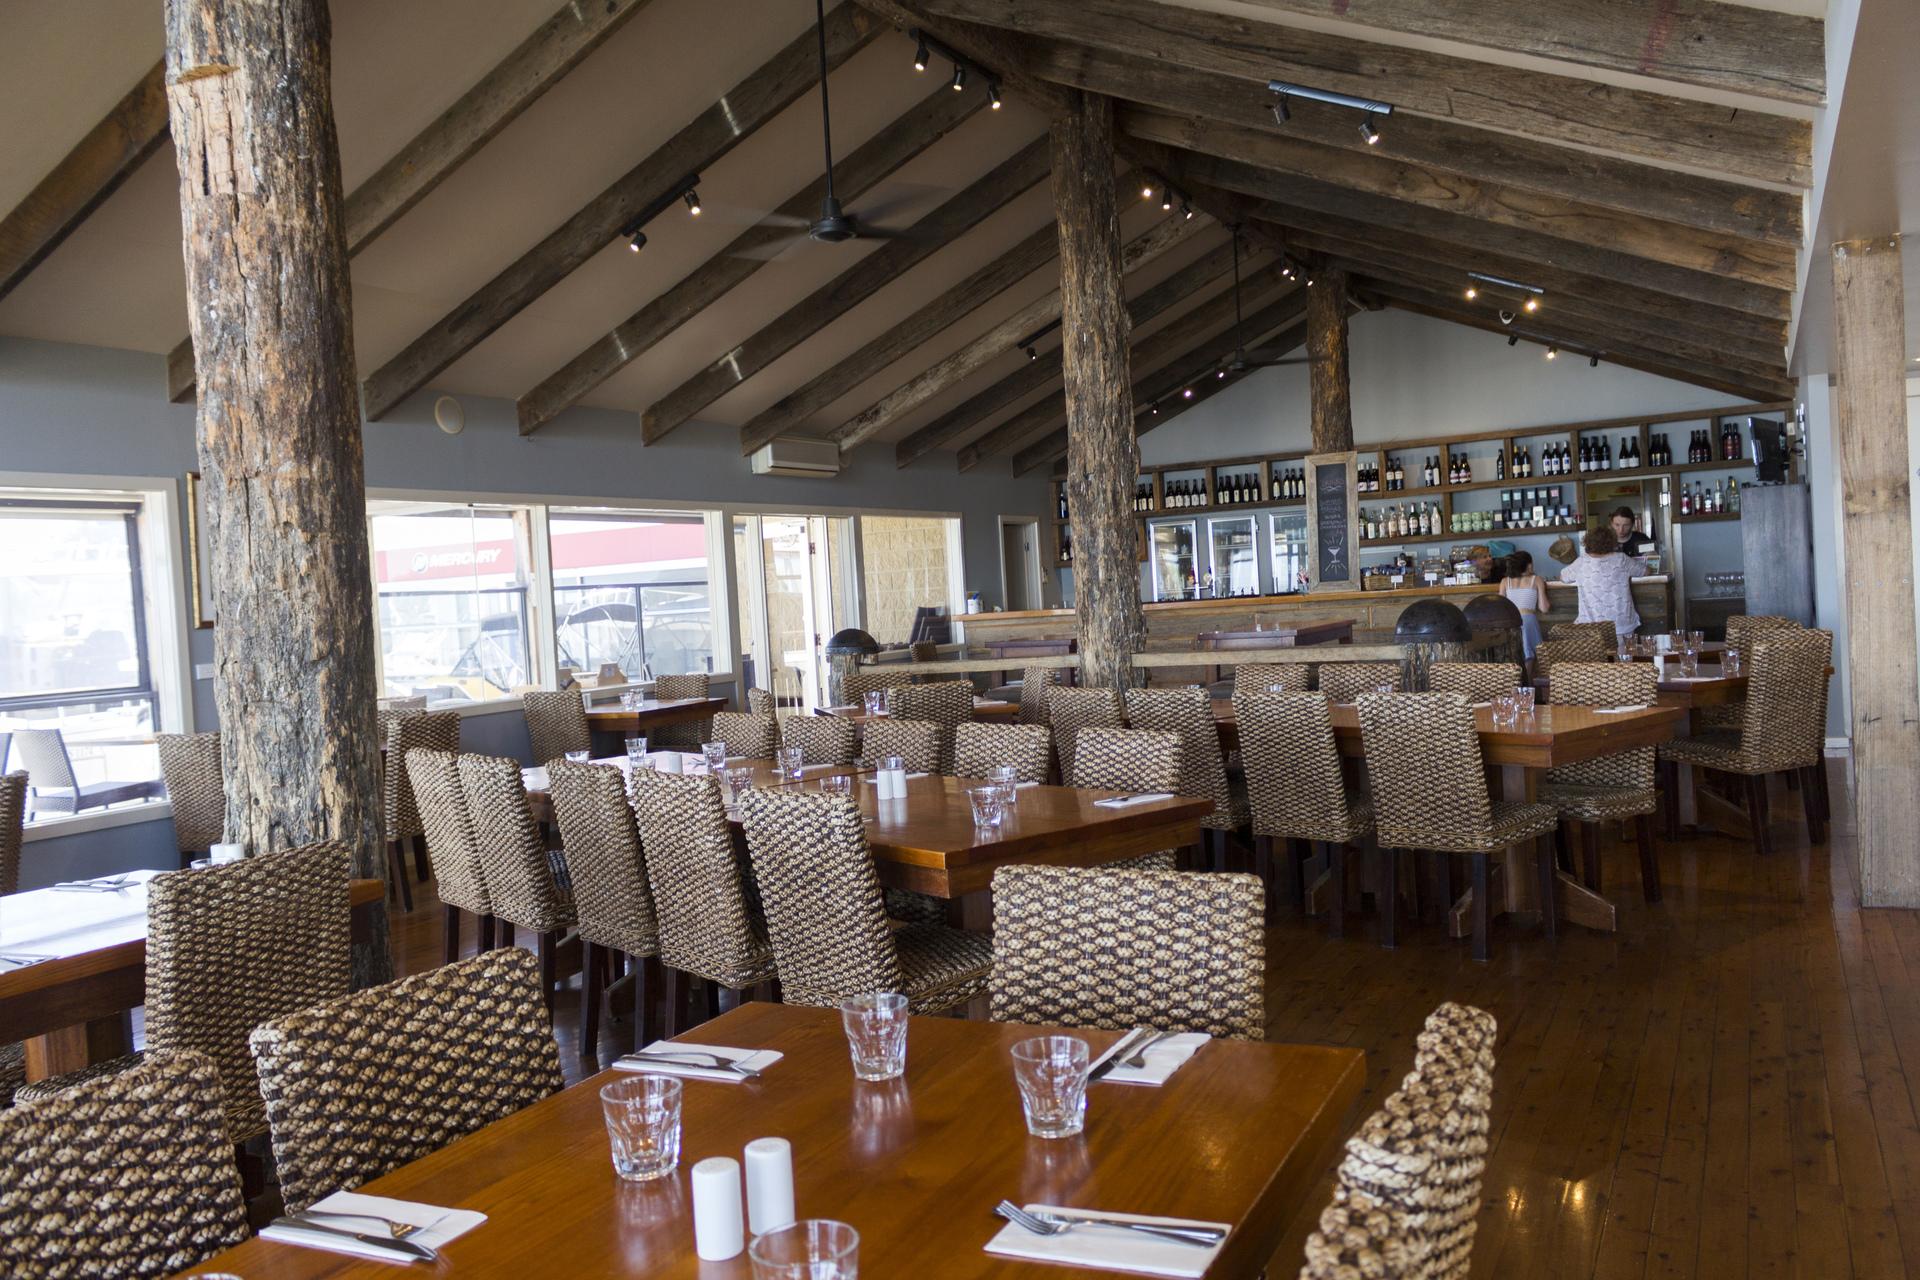 b - The Foreshore Bar & Restaurant